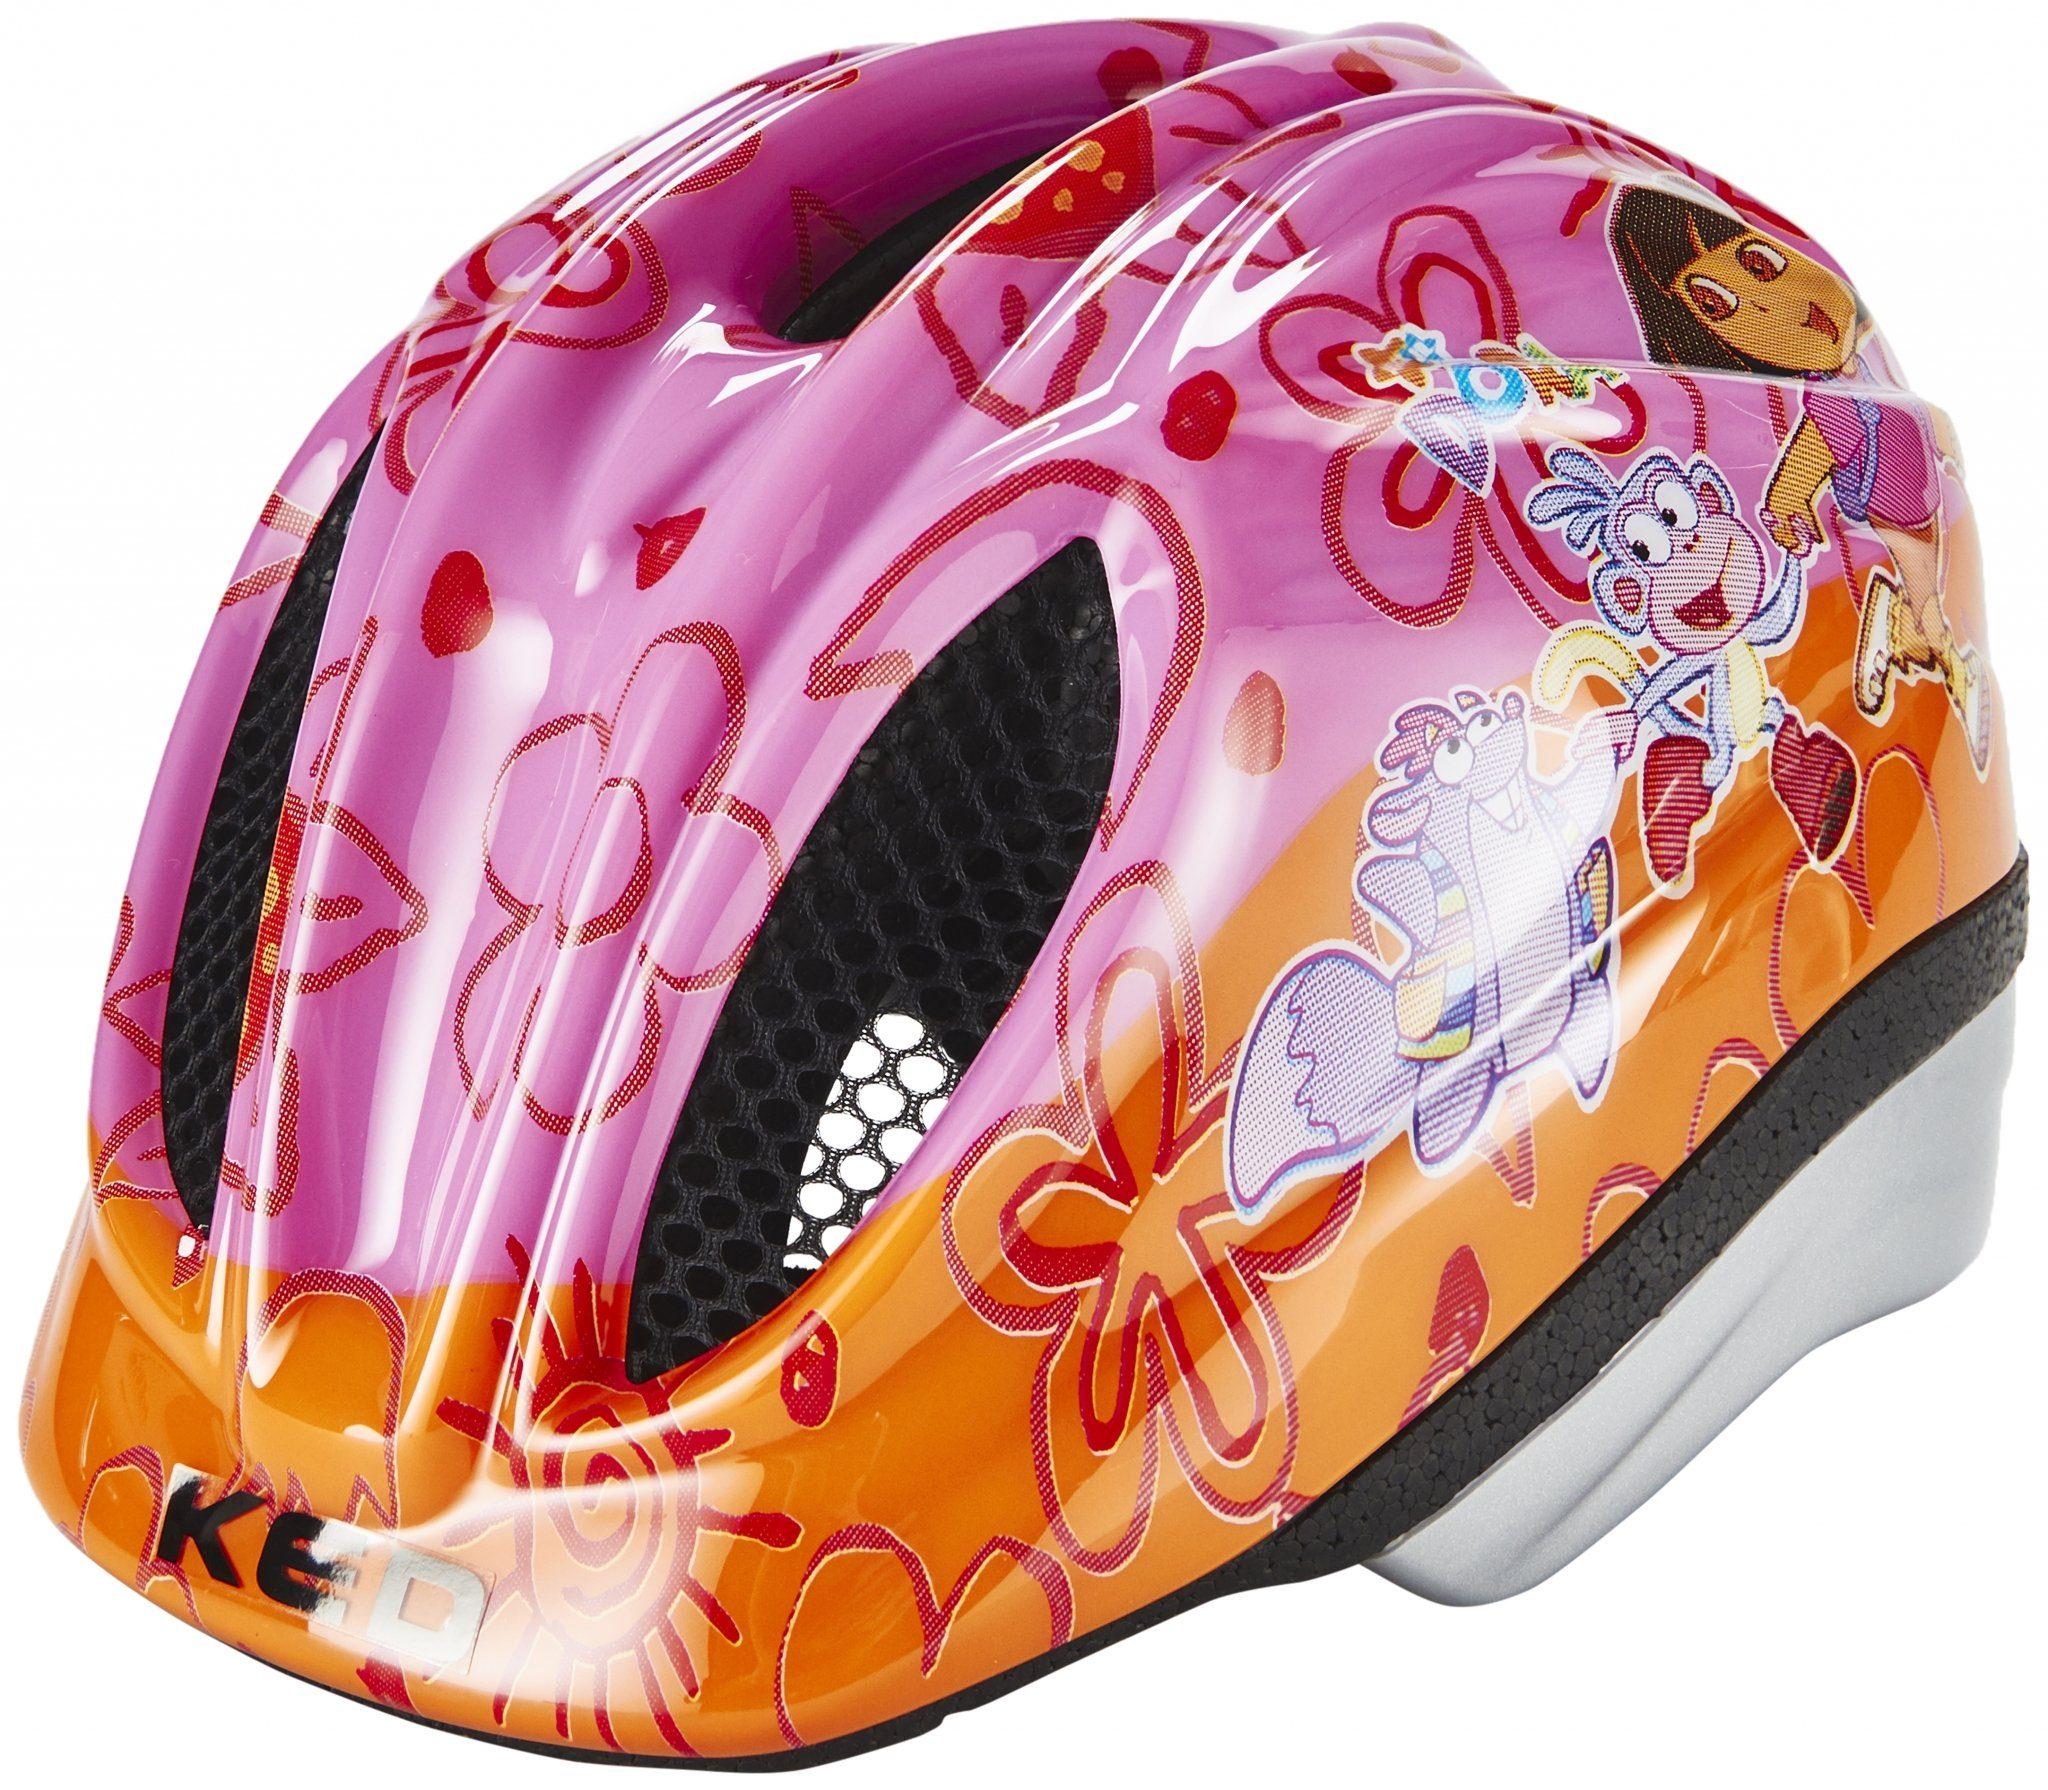 KED Fahrradhelm »Meggy Originals Helmet Kids«